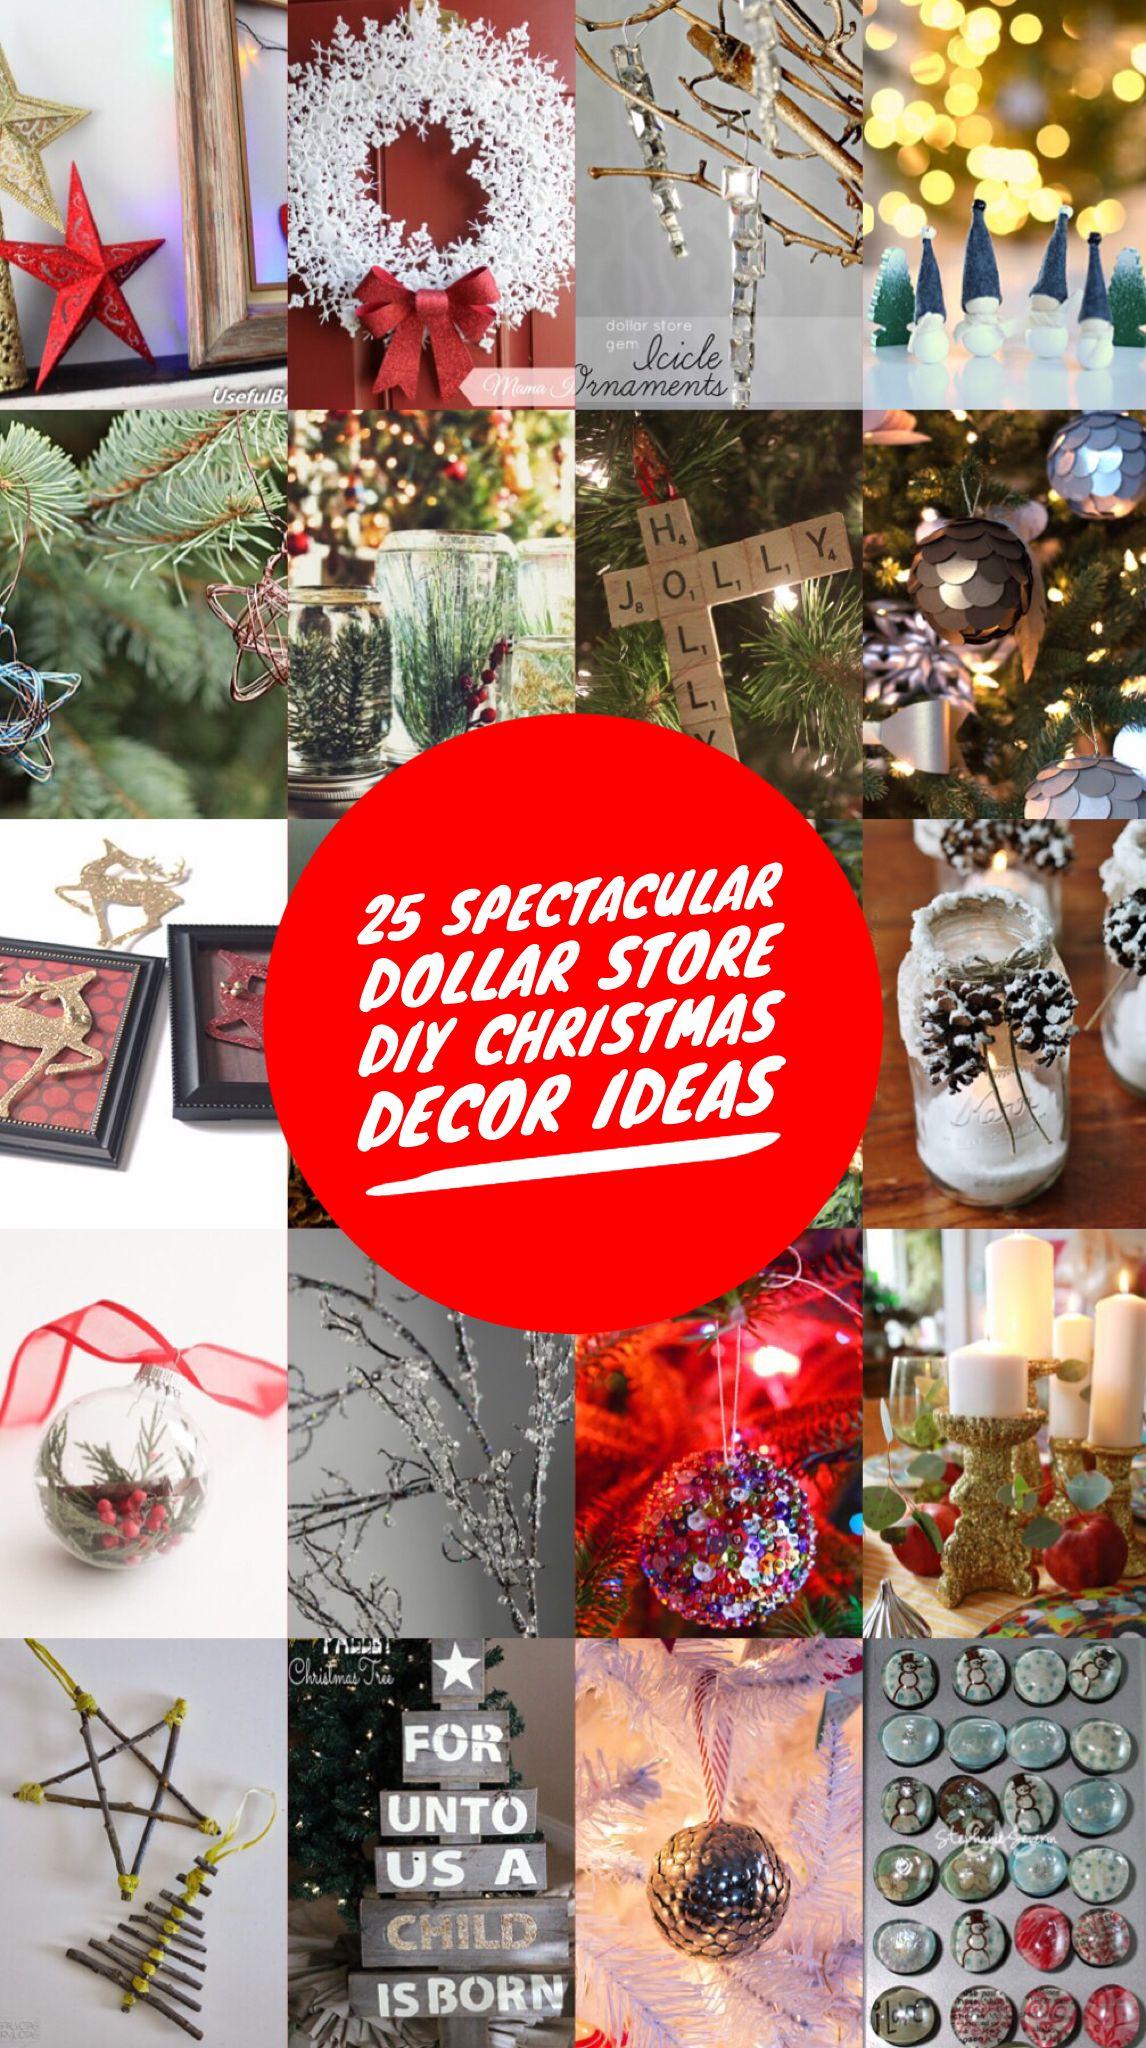 25 Spectacular Dollar Store Diy Christmas Decor Ideas Diy Christmas Decorations Dollar Store Christmas Decor Diy Christmas Diy